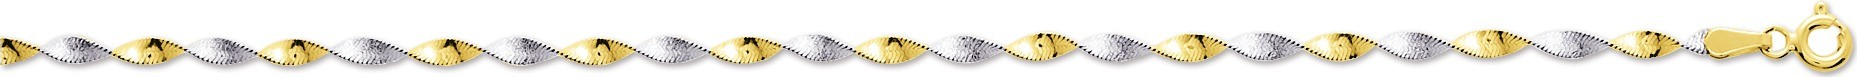 bijoux or-collier or bicolore  592.2G